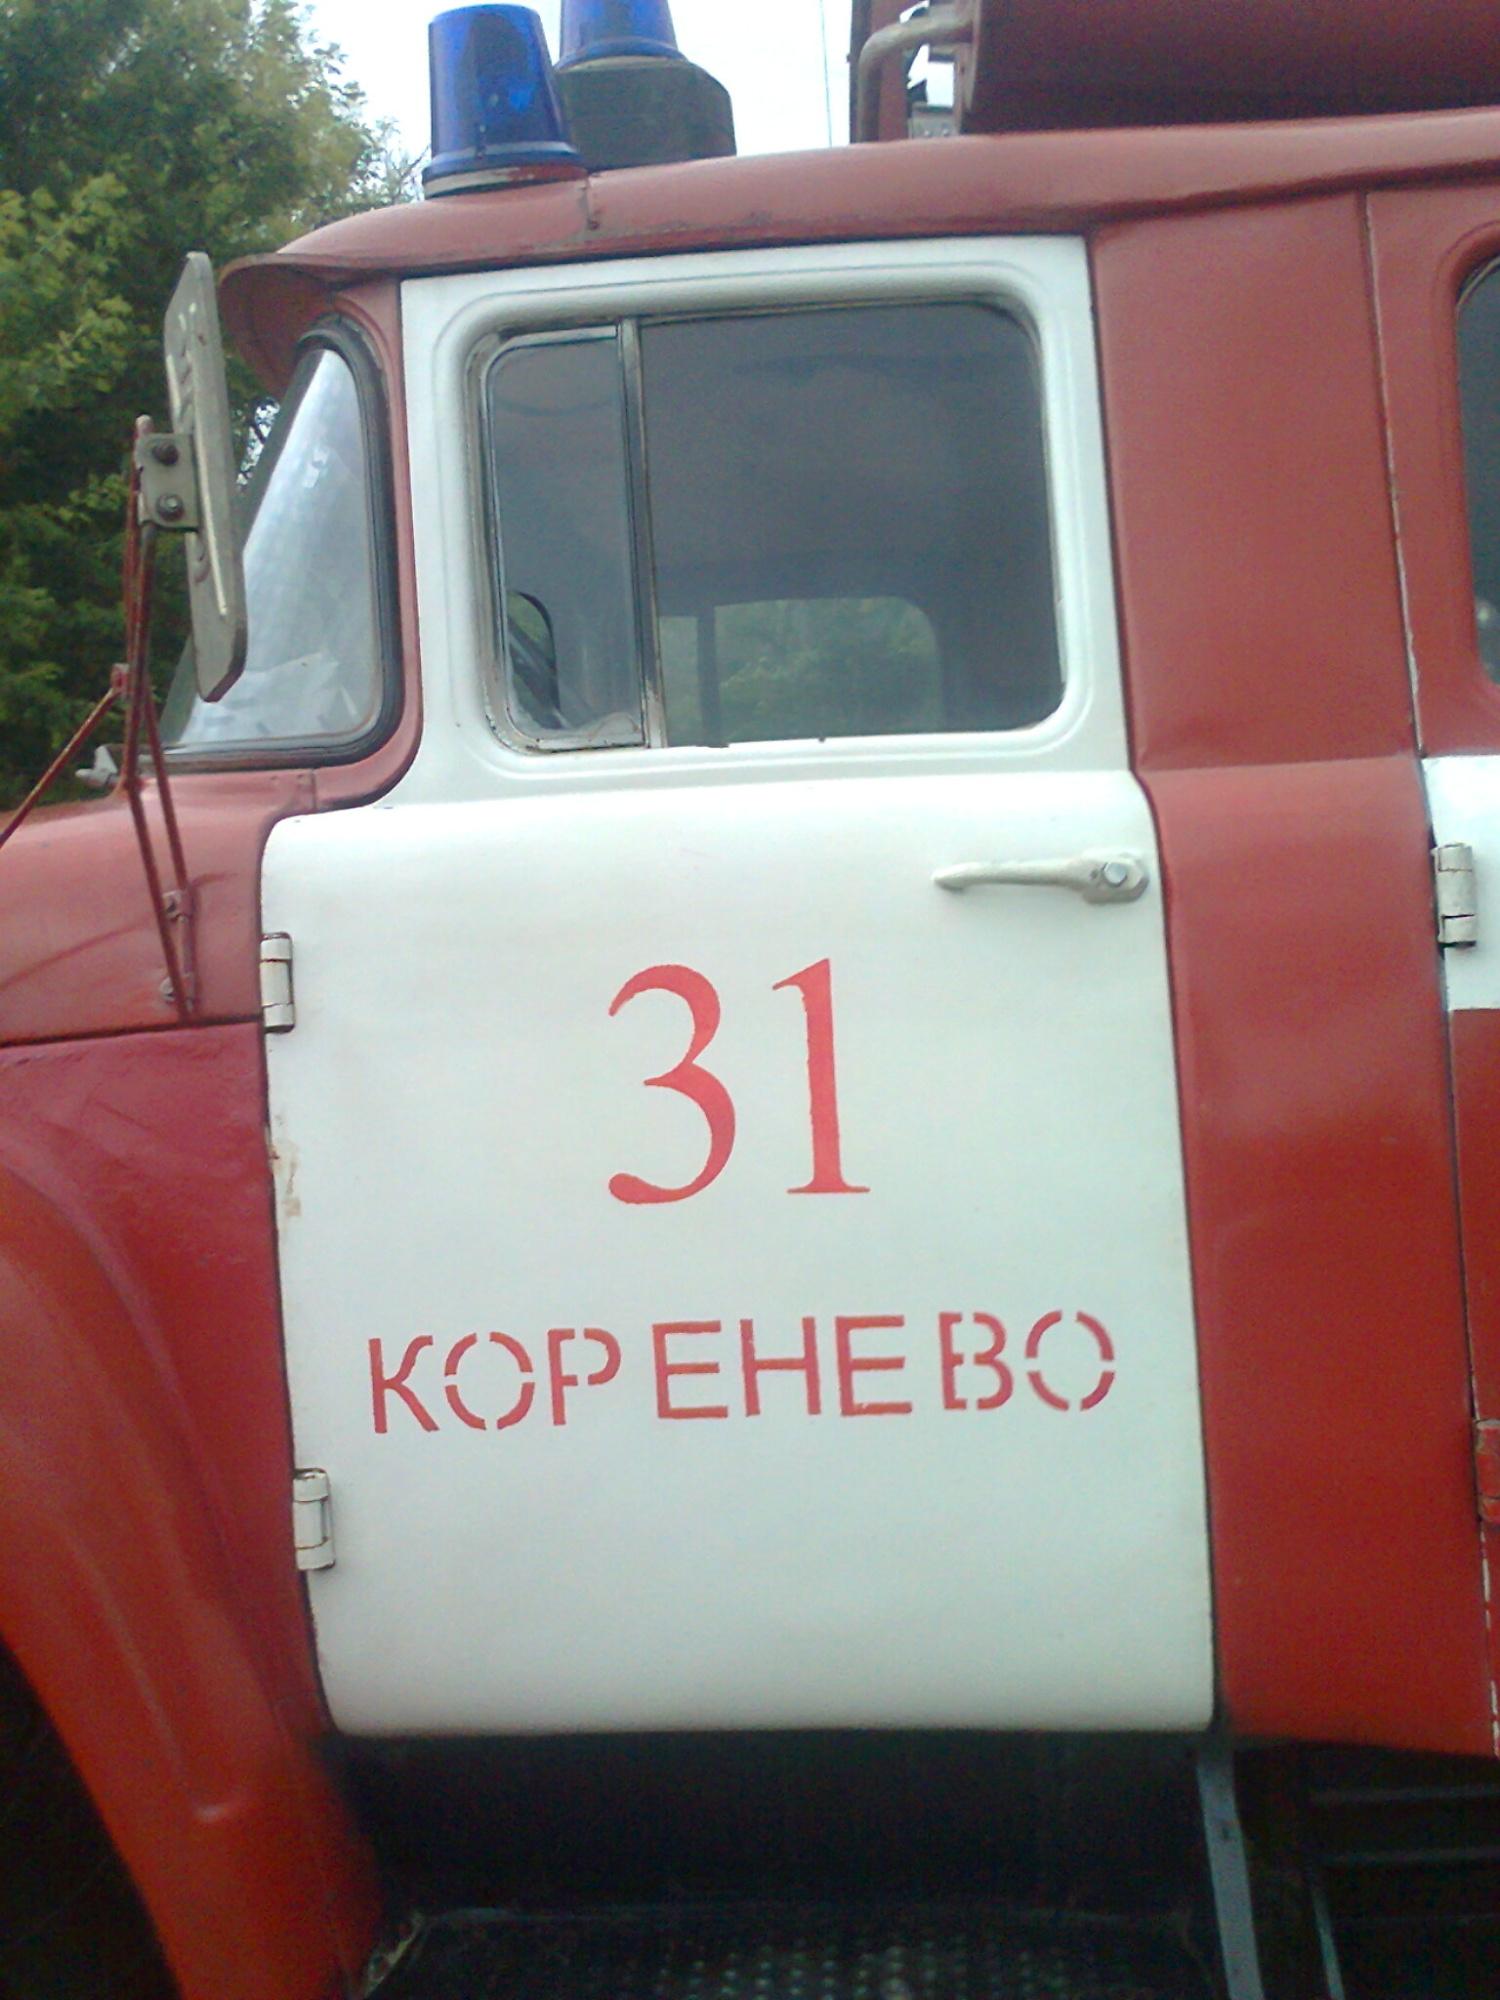 Пожар на ул. Серова в п. Коренево, Кореневского района